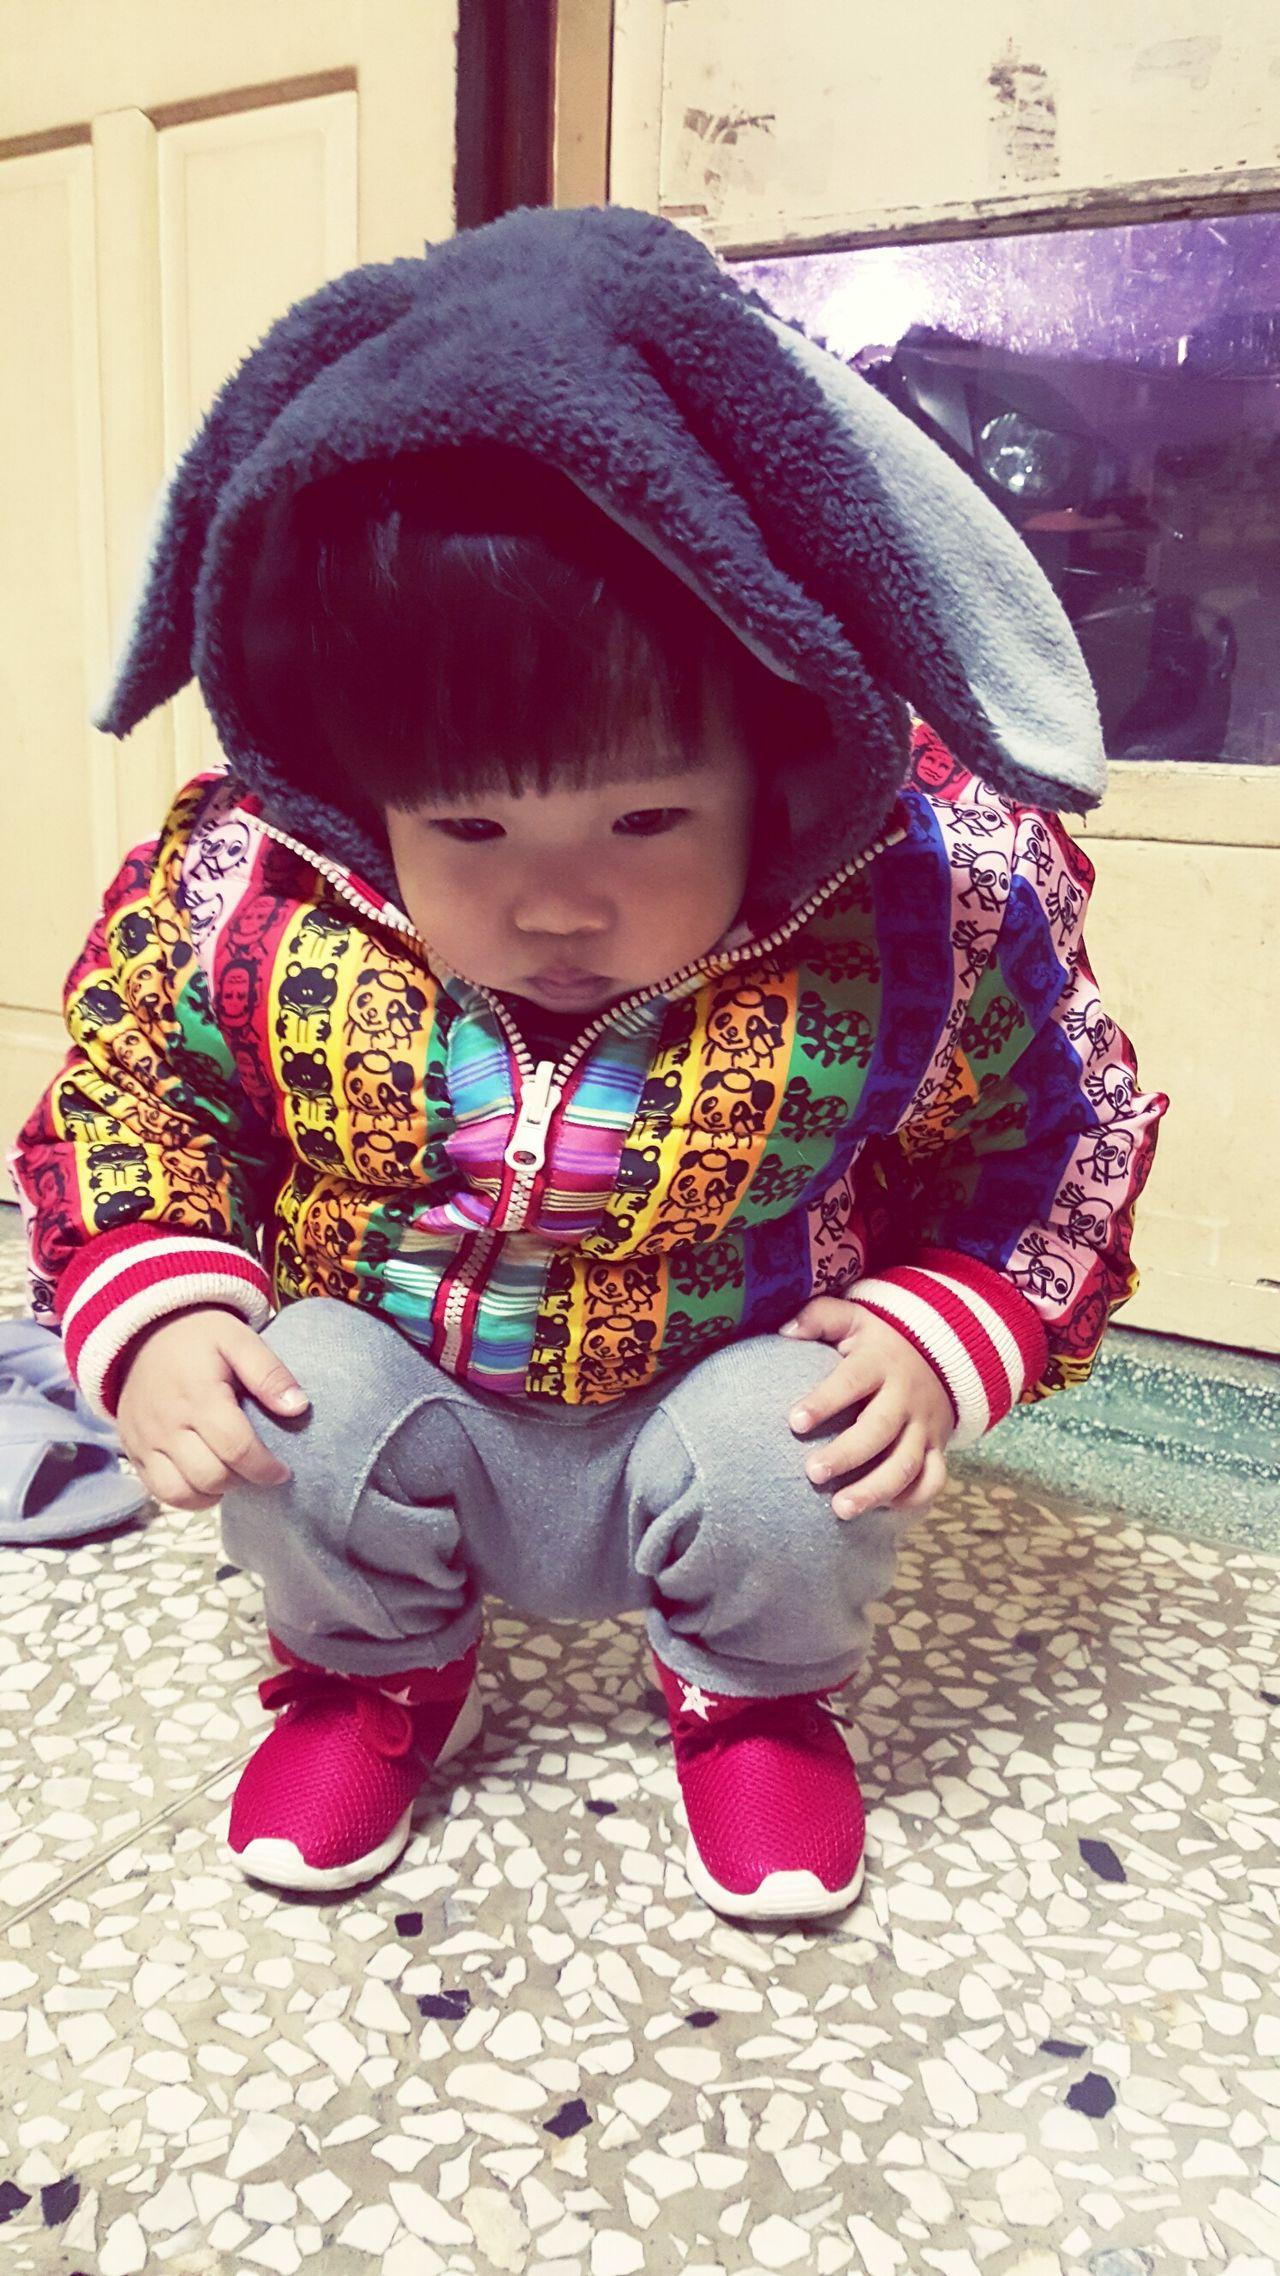 Cute Babyboy Aliceinwonderland Child Rabbit Wonderland Boy Rabbit 🐇 Taiwan Tainan City